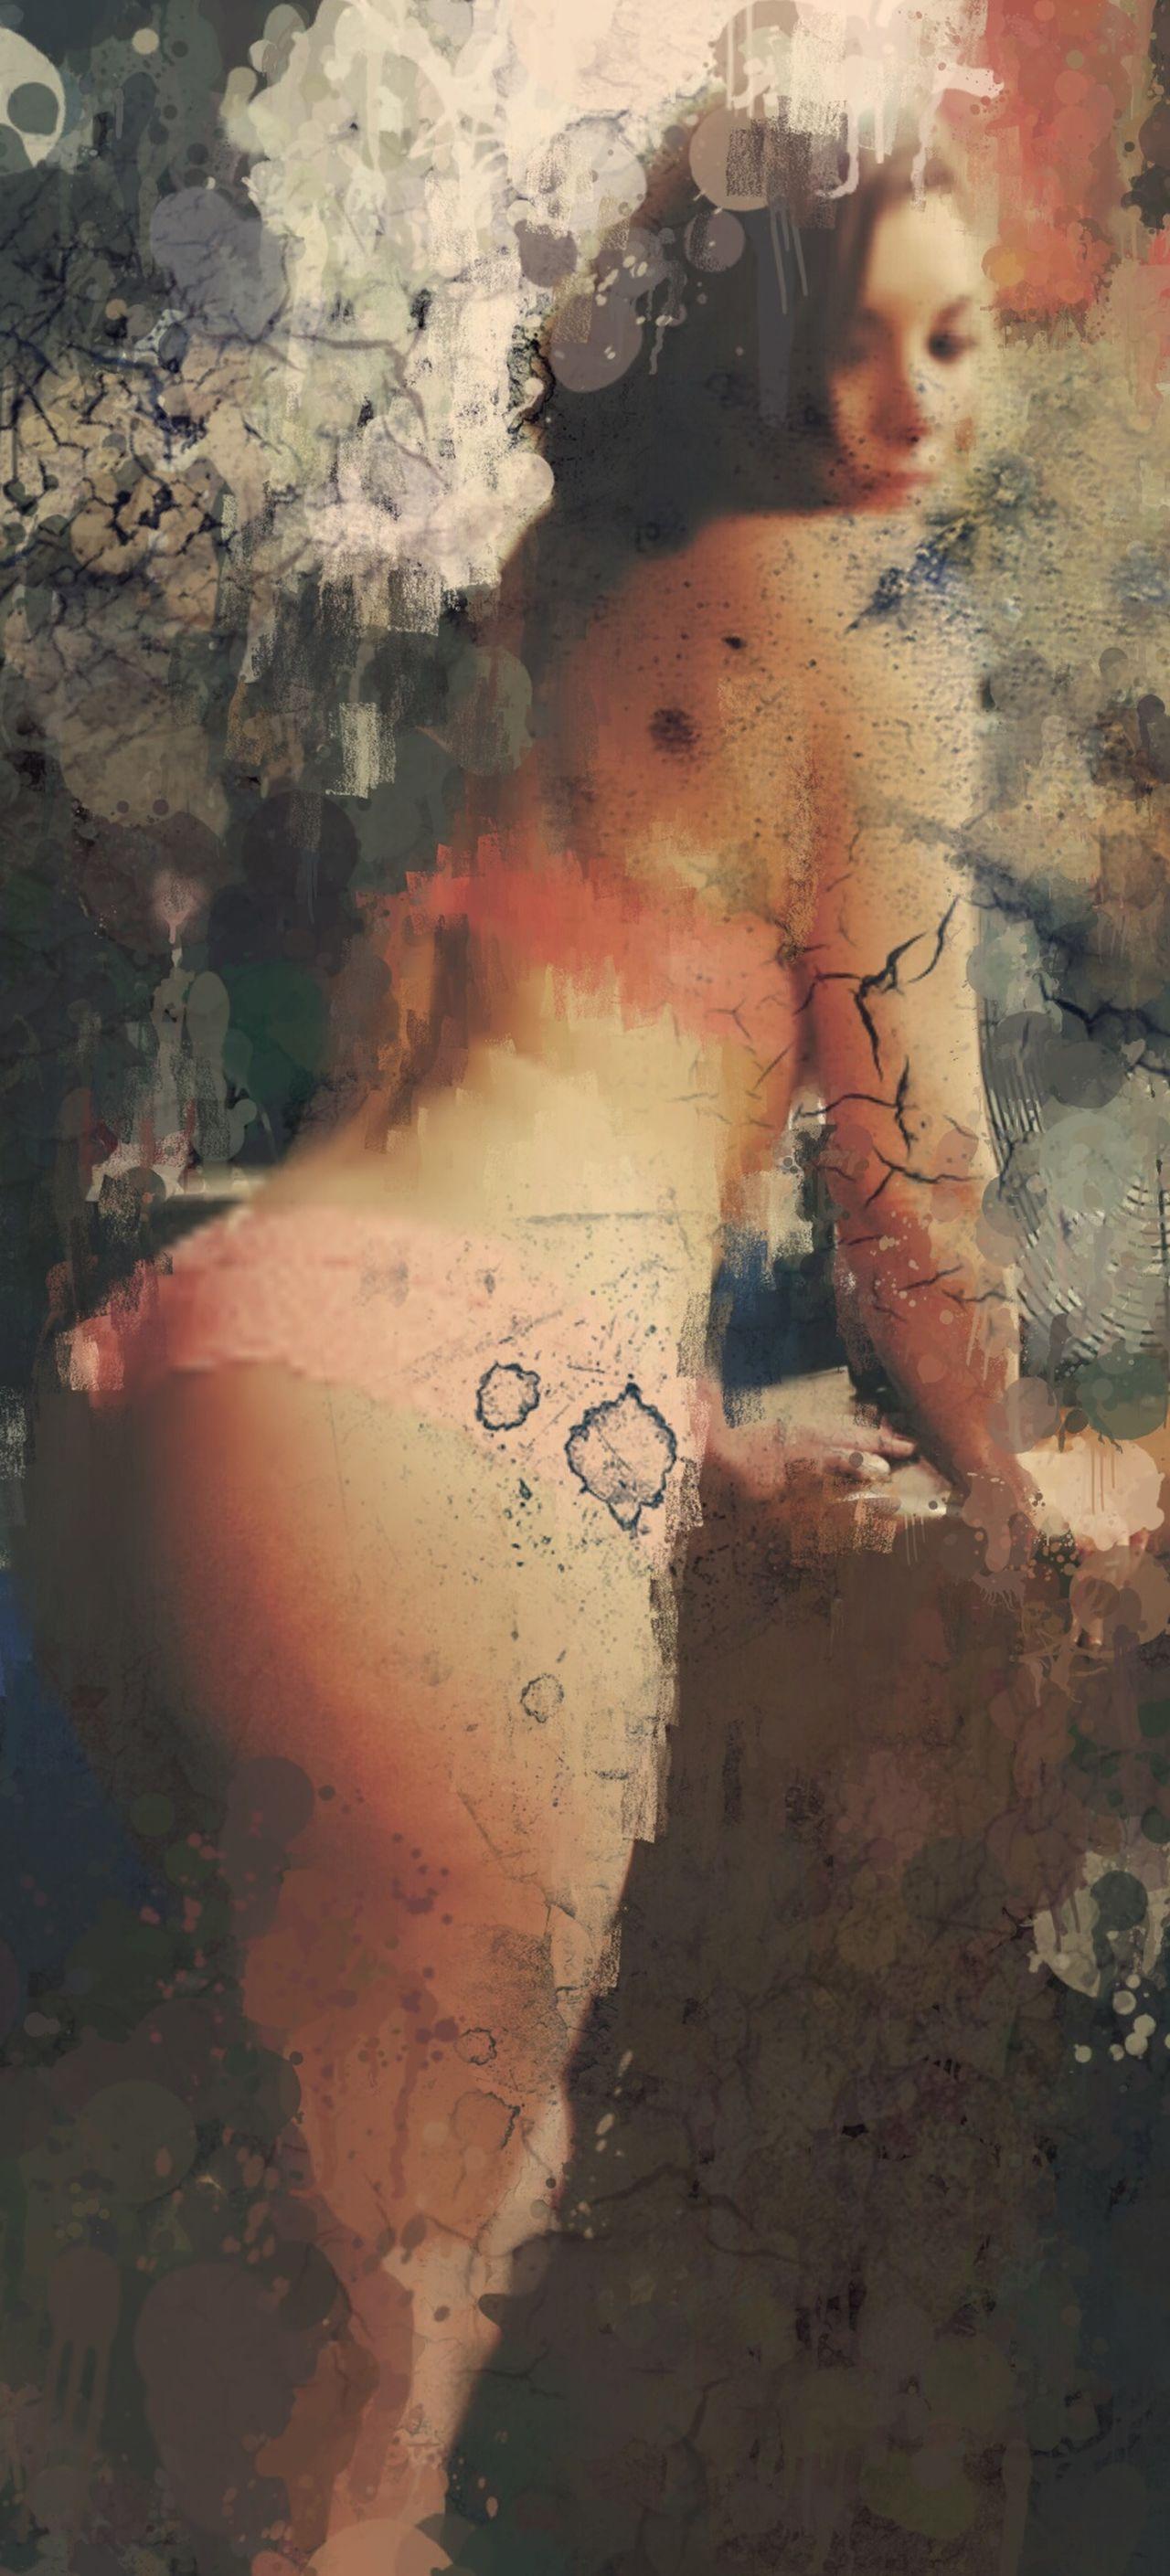 Boudoir Photography Creativity Human Body Art Femininity People Portrait Woman Portraiture Vibrant Color People Photography Model Peoplephotography Sexyass Sexywoman SexyGirl.♥ Vintage❤ SexypicsClassy Lady Boudior Photography Romance ❤✨✨ Sensual 💕 Beautiful Dramatic Angle People Sexywomen Sexyselfie Woman 🌹 Tisa Clark 🌹